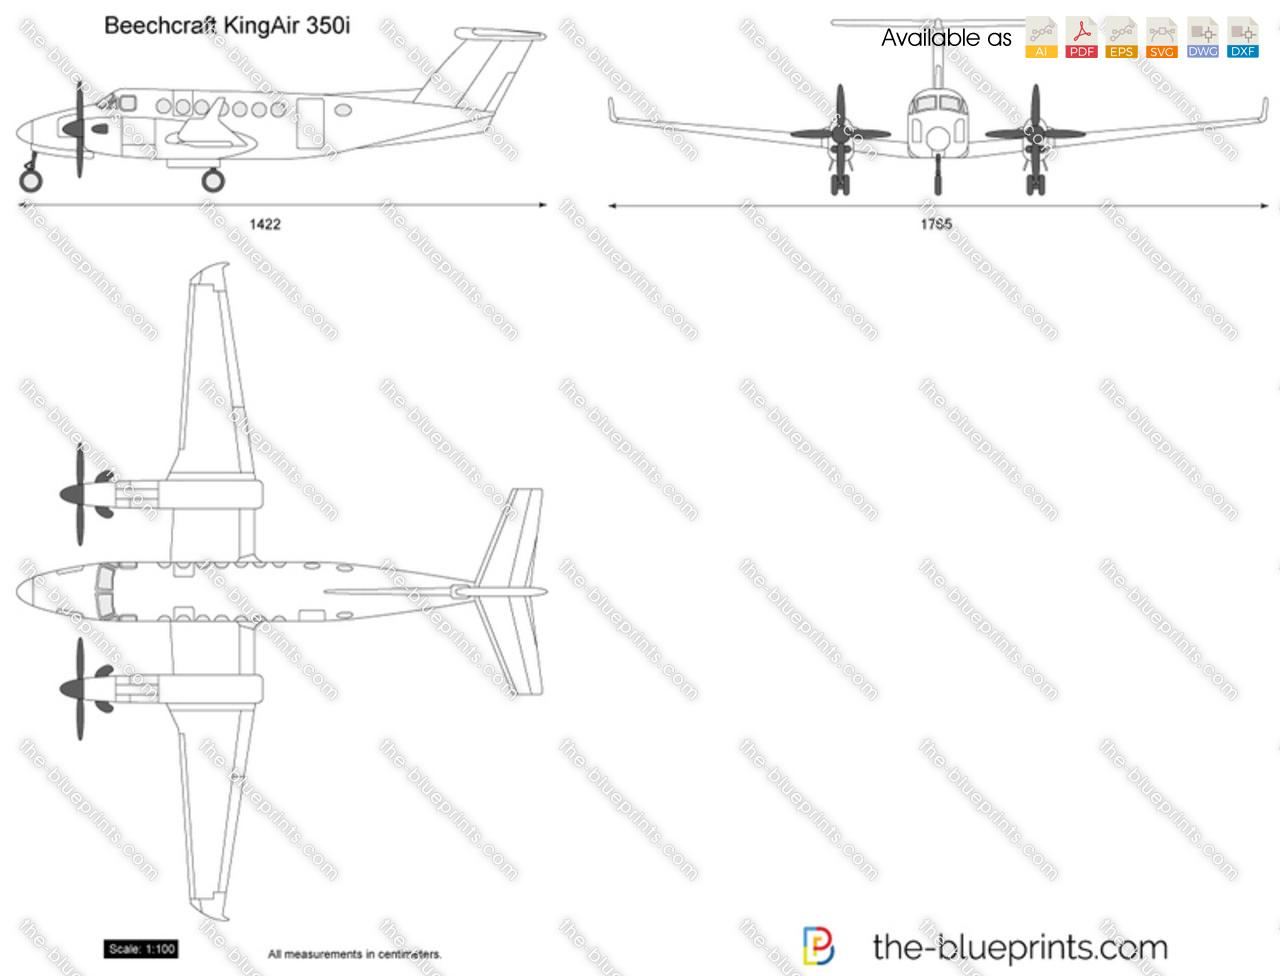 Beech King Air 350I Price